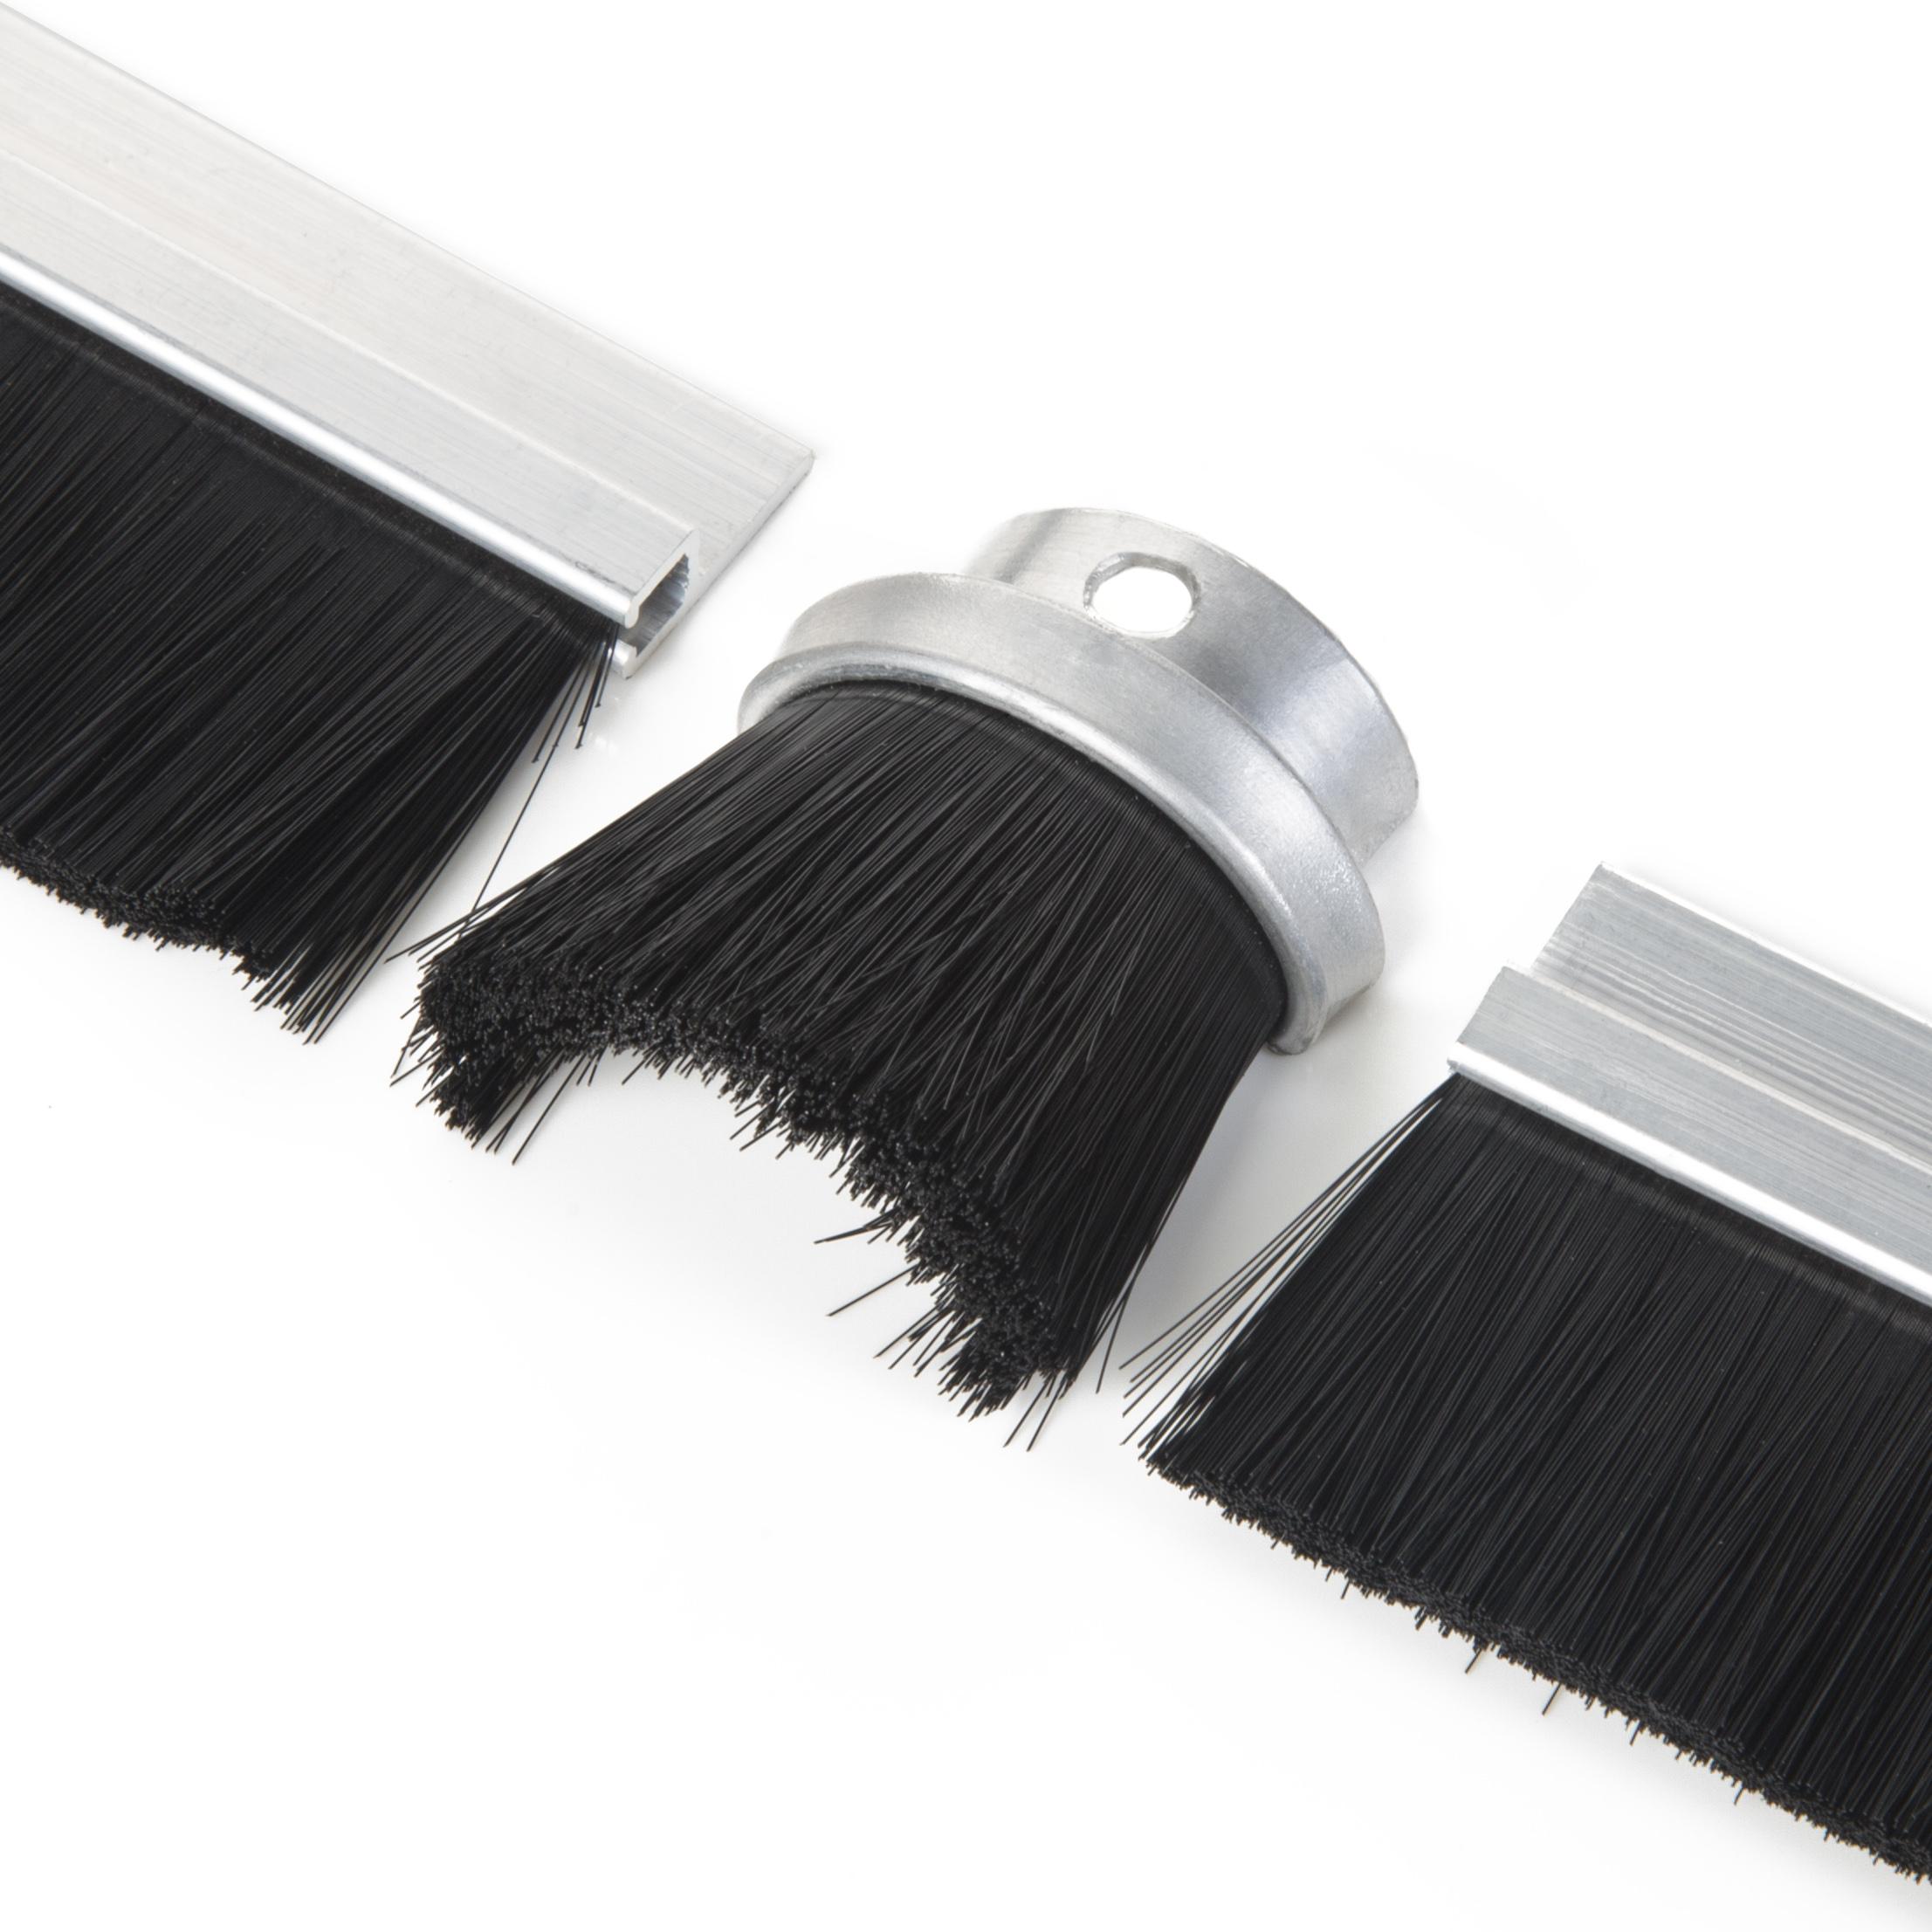 Kleeneze-KOTI Superseal Seals for Folding Shutter Doors